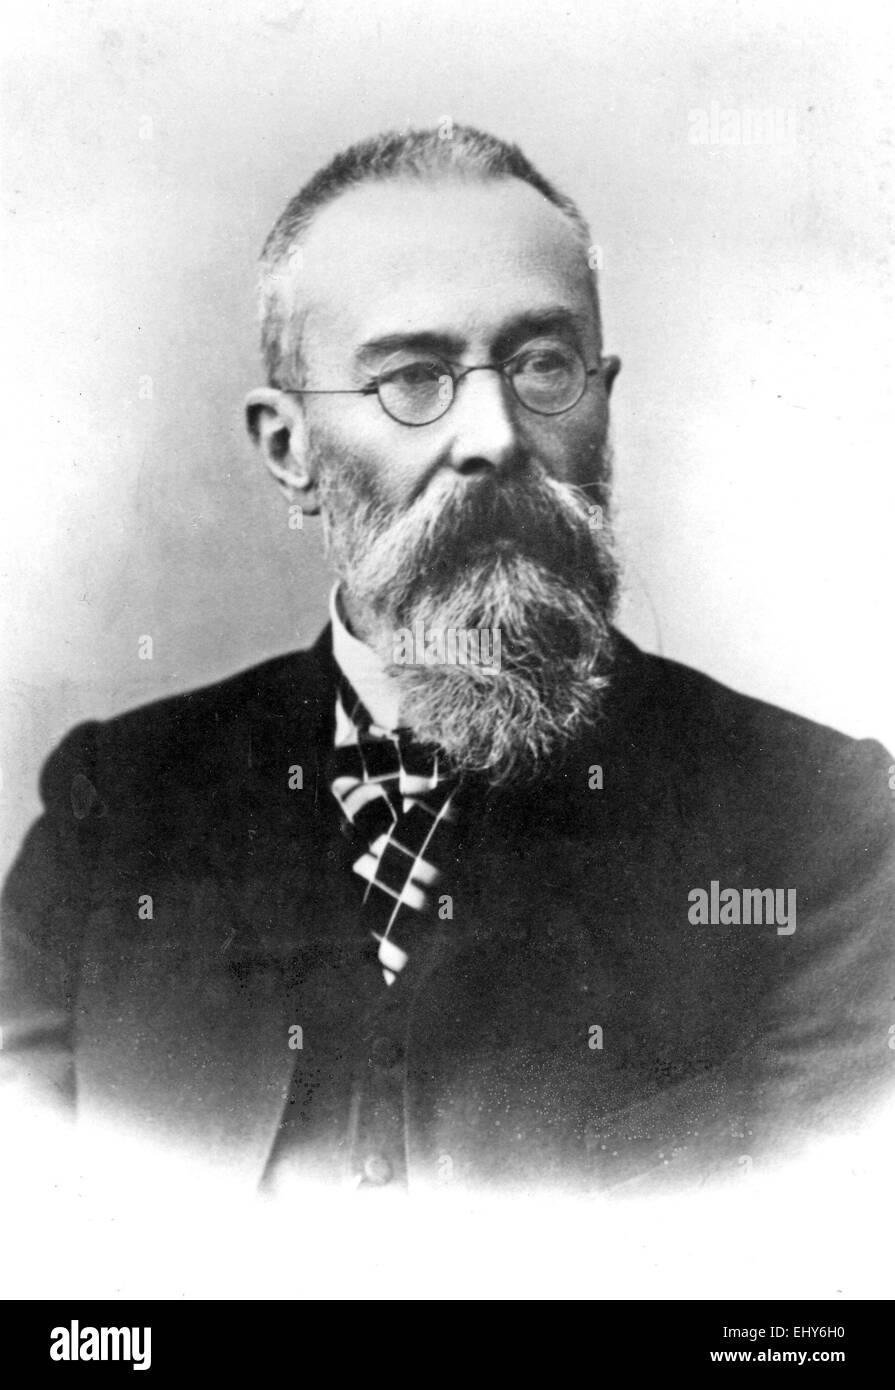 NIKOLAI RIMSKY-KORSAKOV (1844-1908) Russian composer - Stock Image